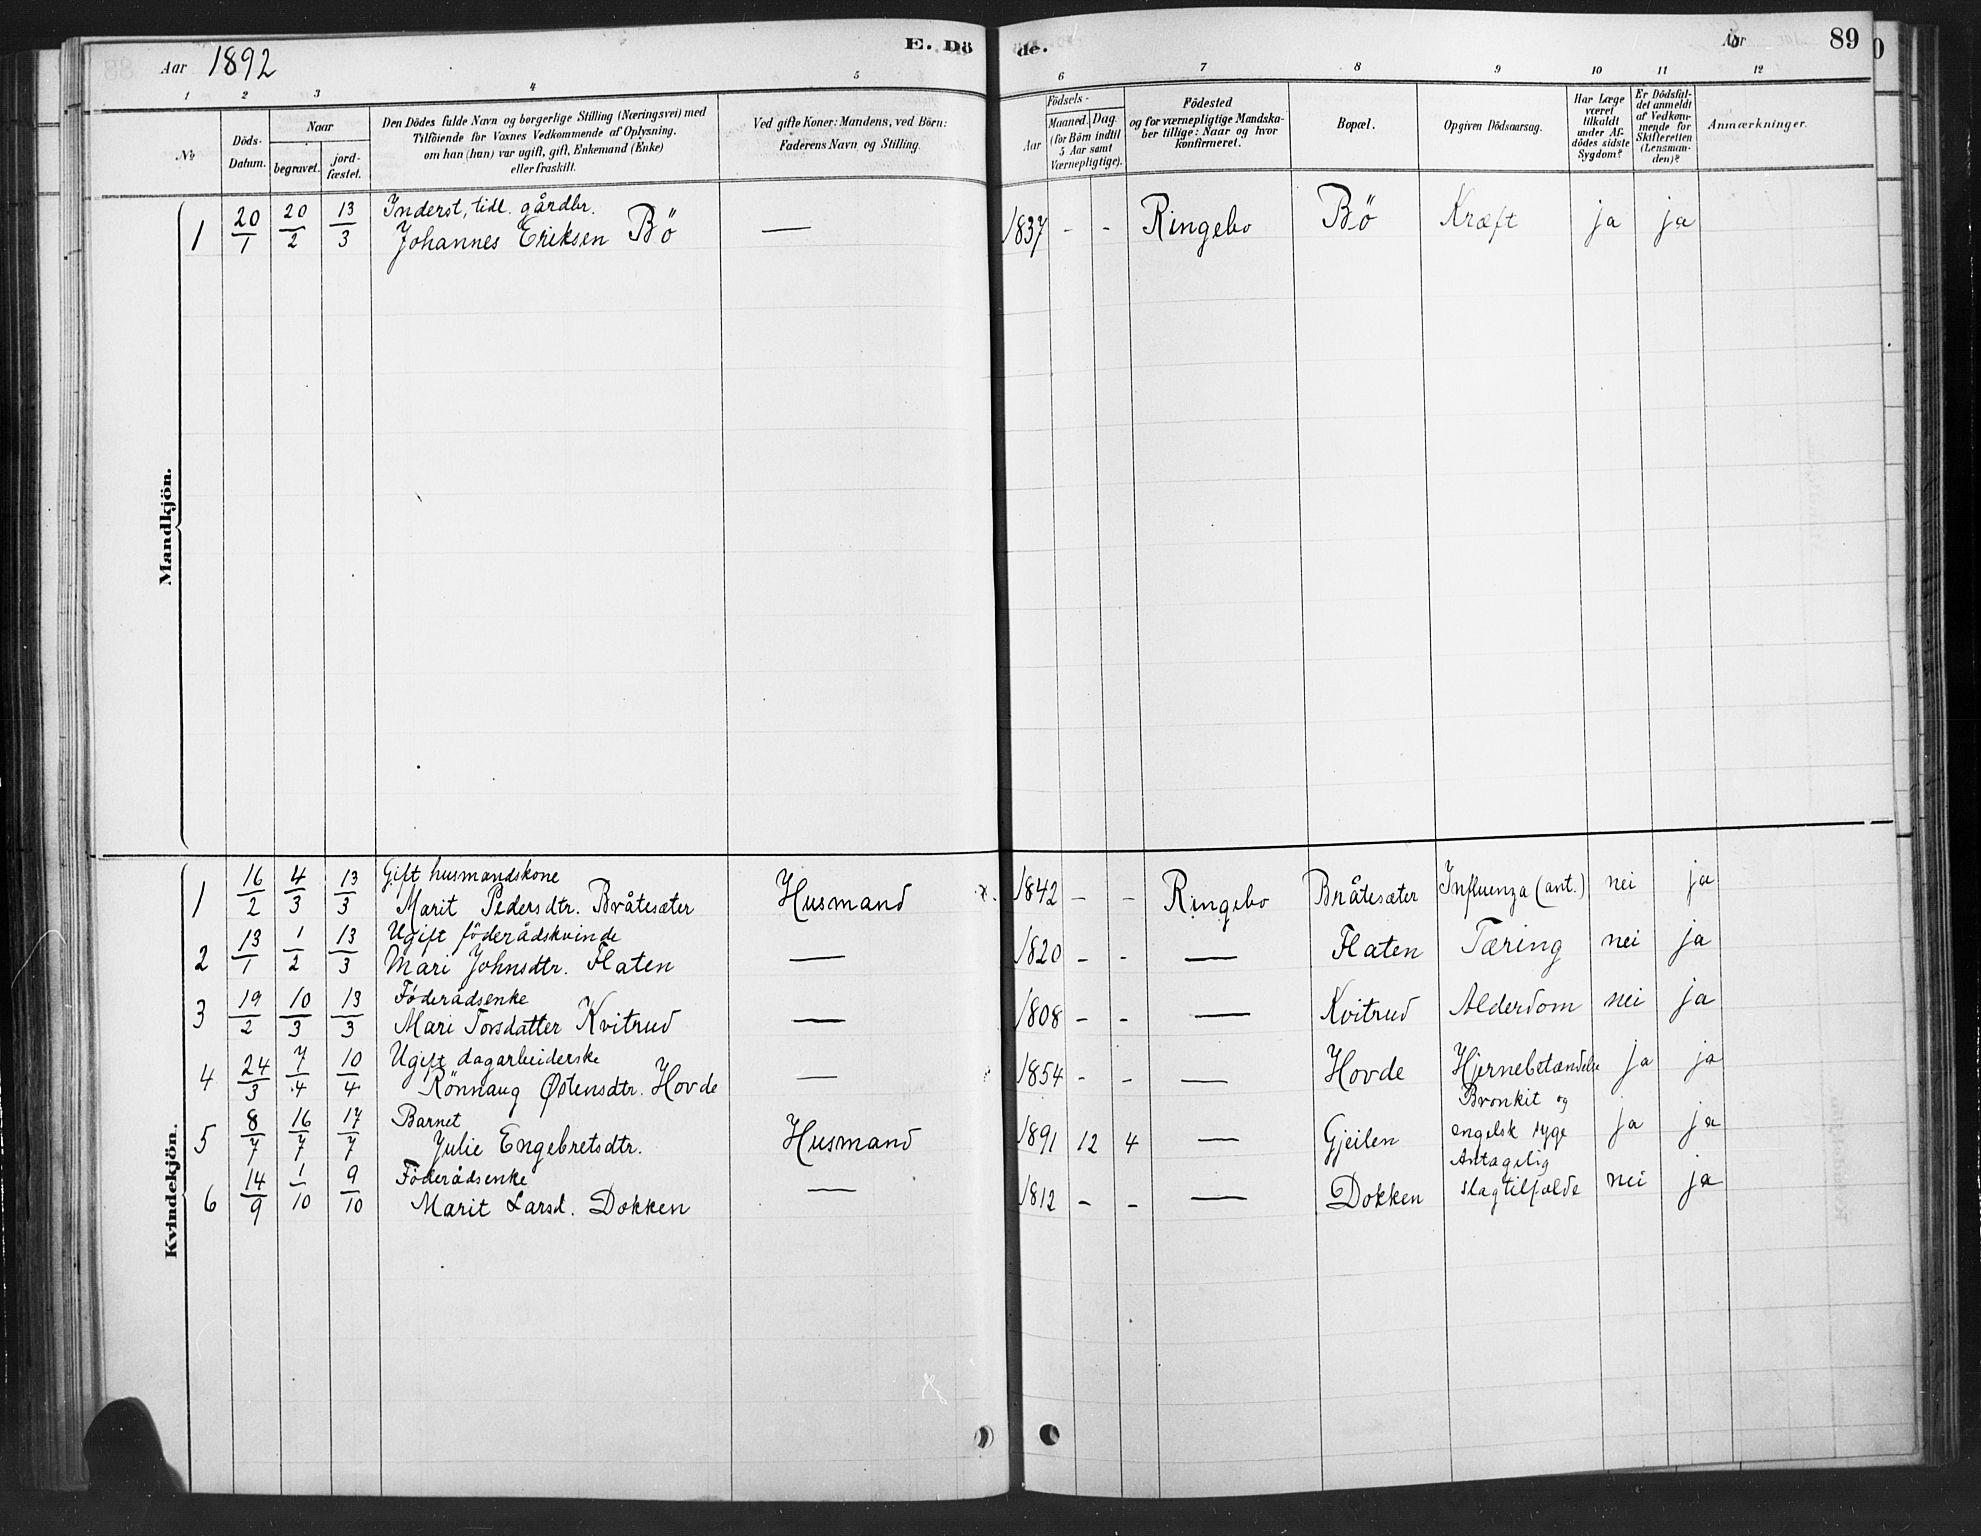 SAH, Ringebu prestekontor, Ministerialbok nr. 10, 1878-1898, s. 89